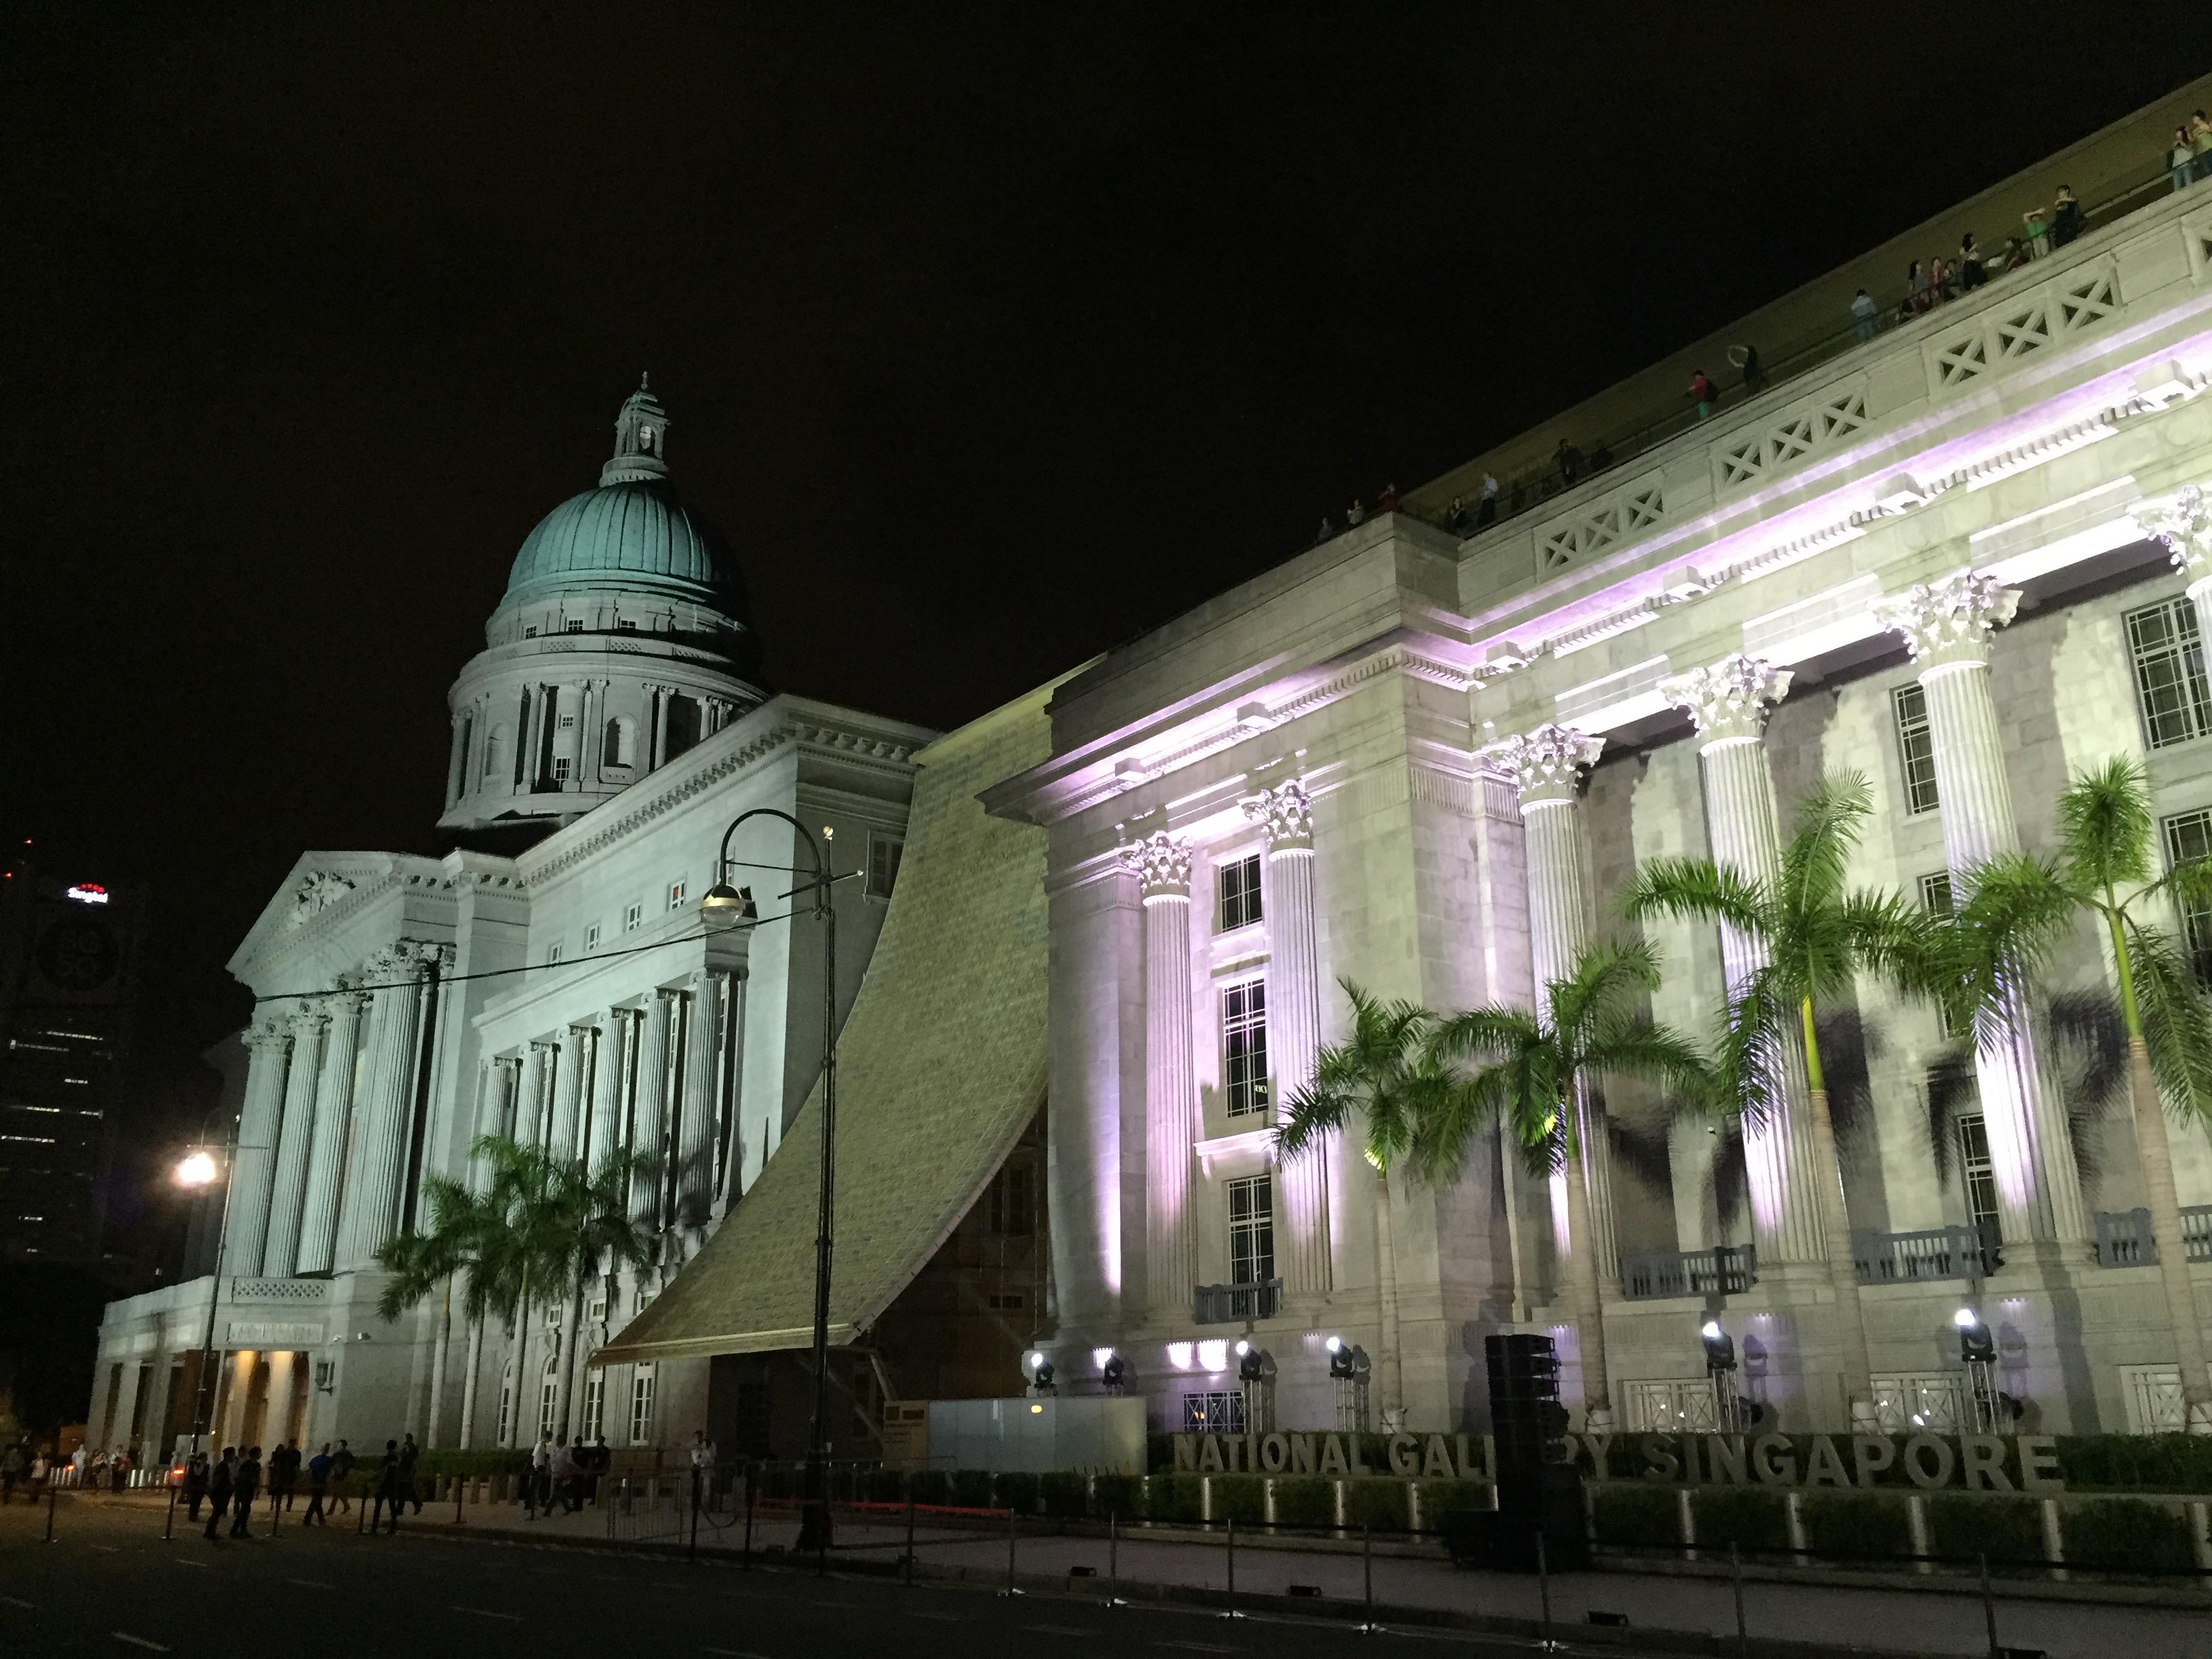 National Gallery Singapore Imagineear